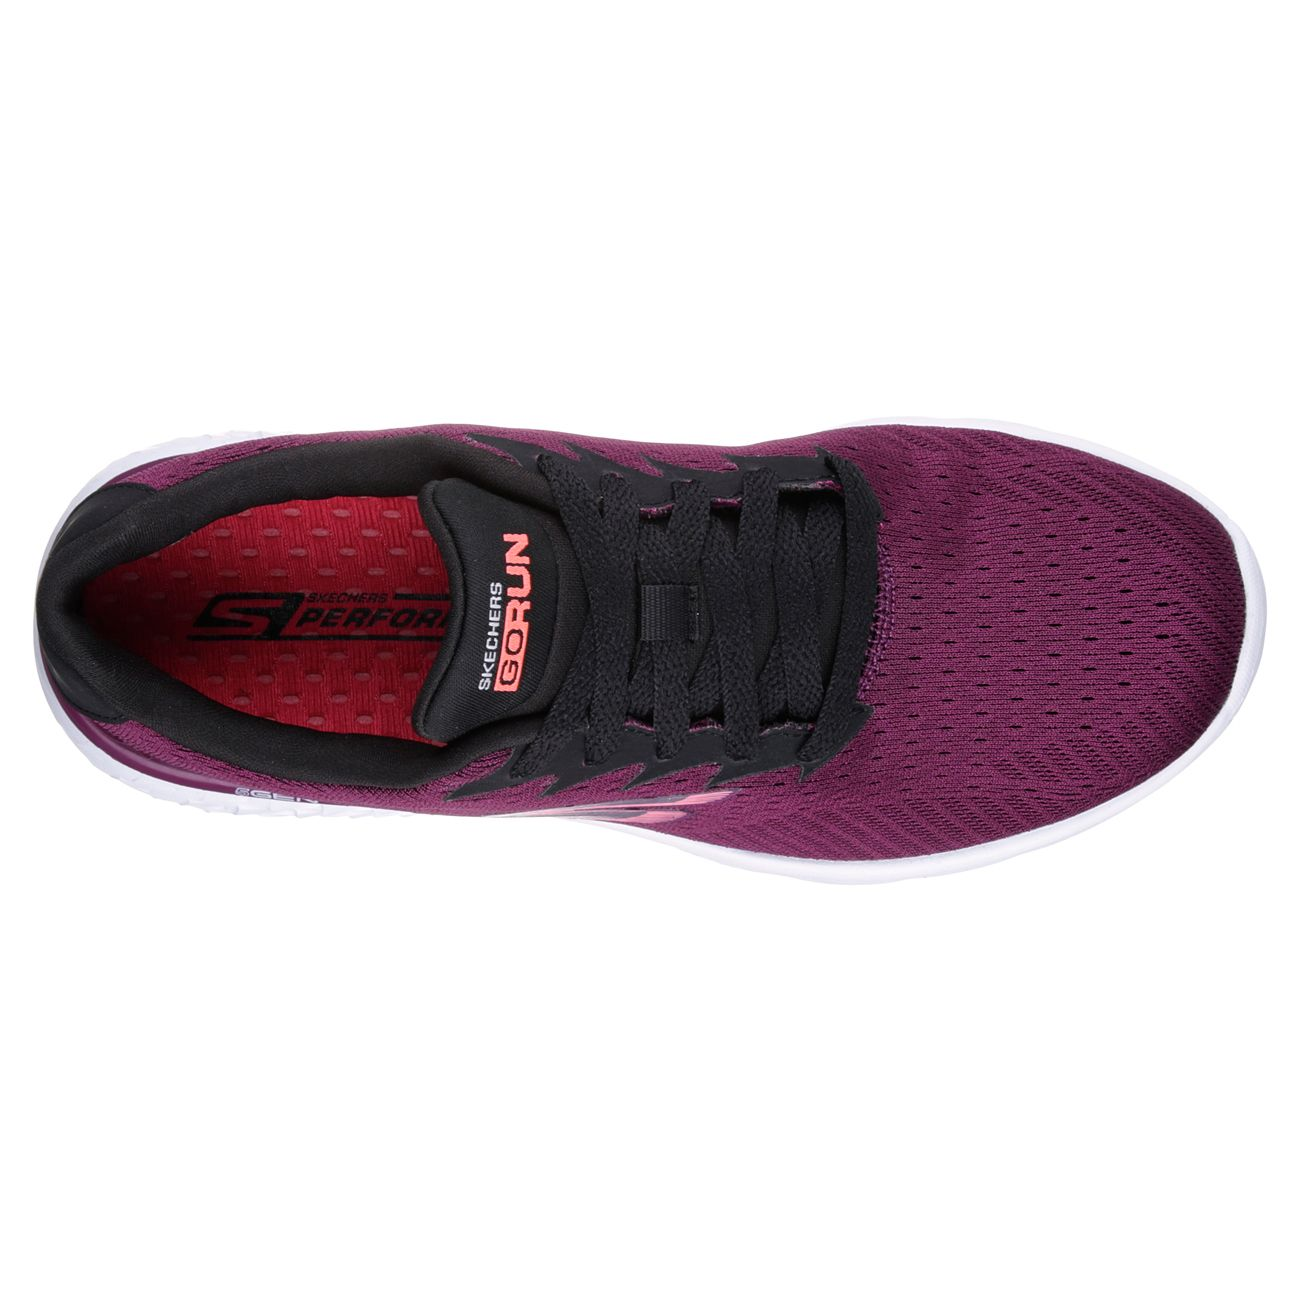 Skechers Go Run 400 Sole Ladies Running Shoes - Sweatband.com